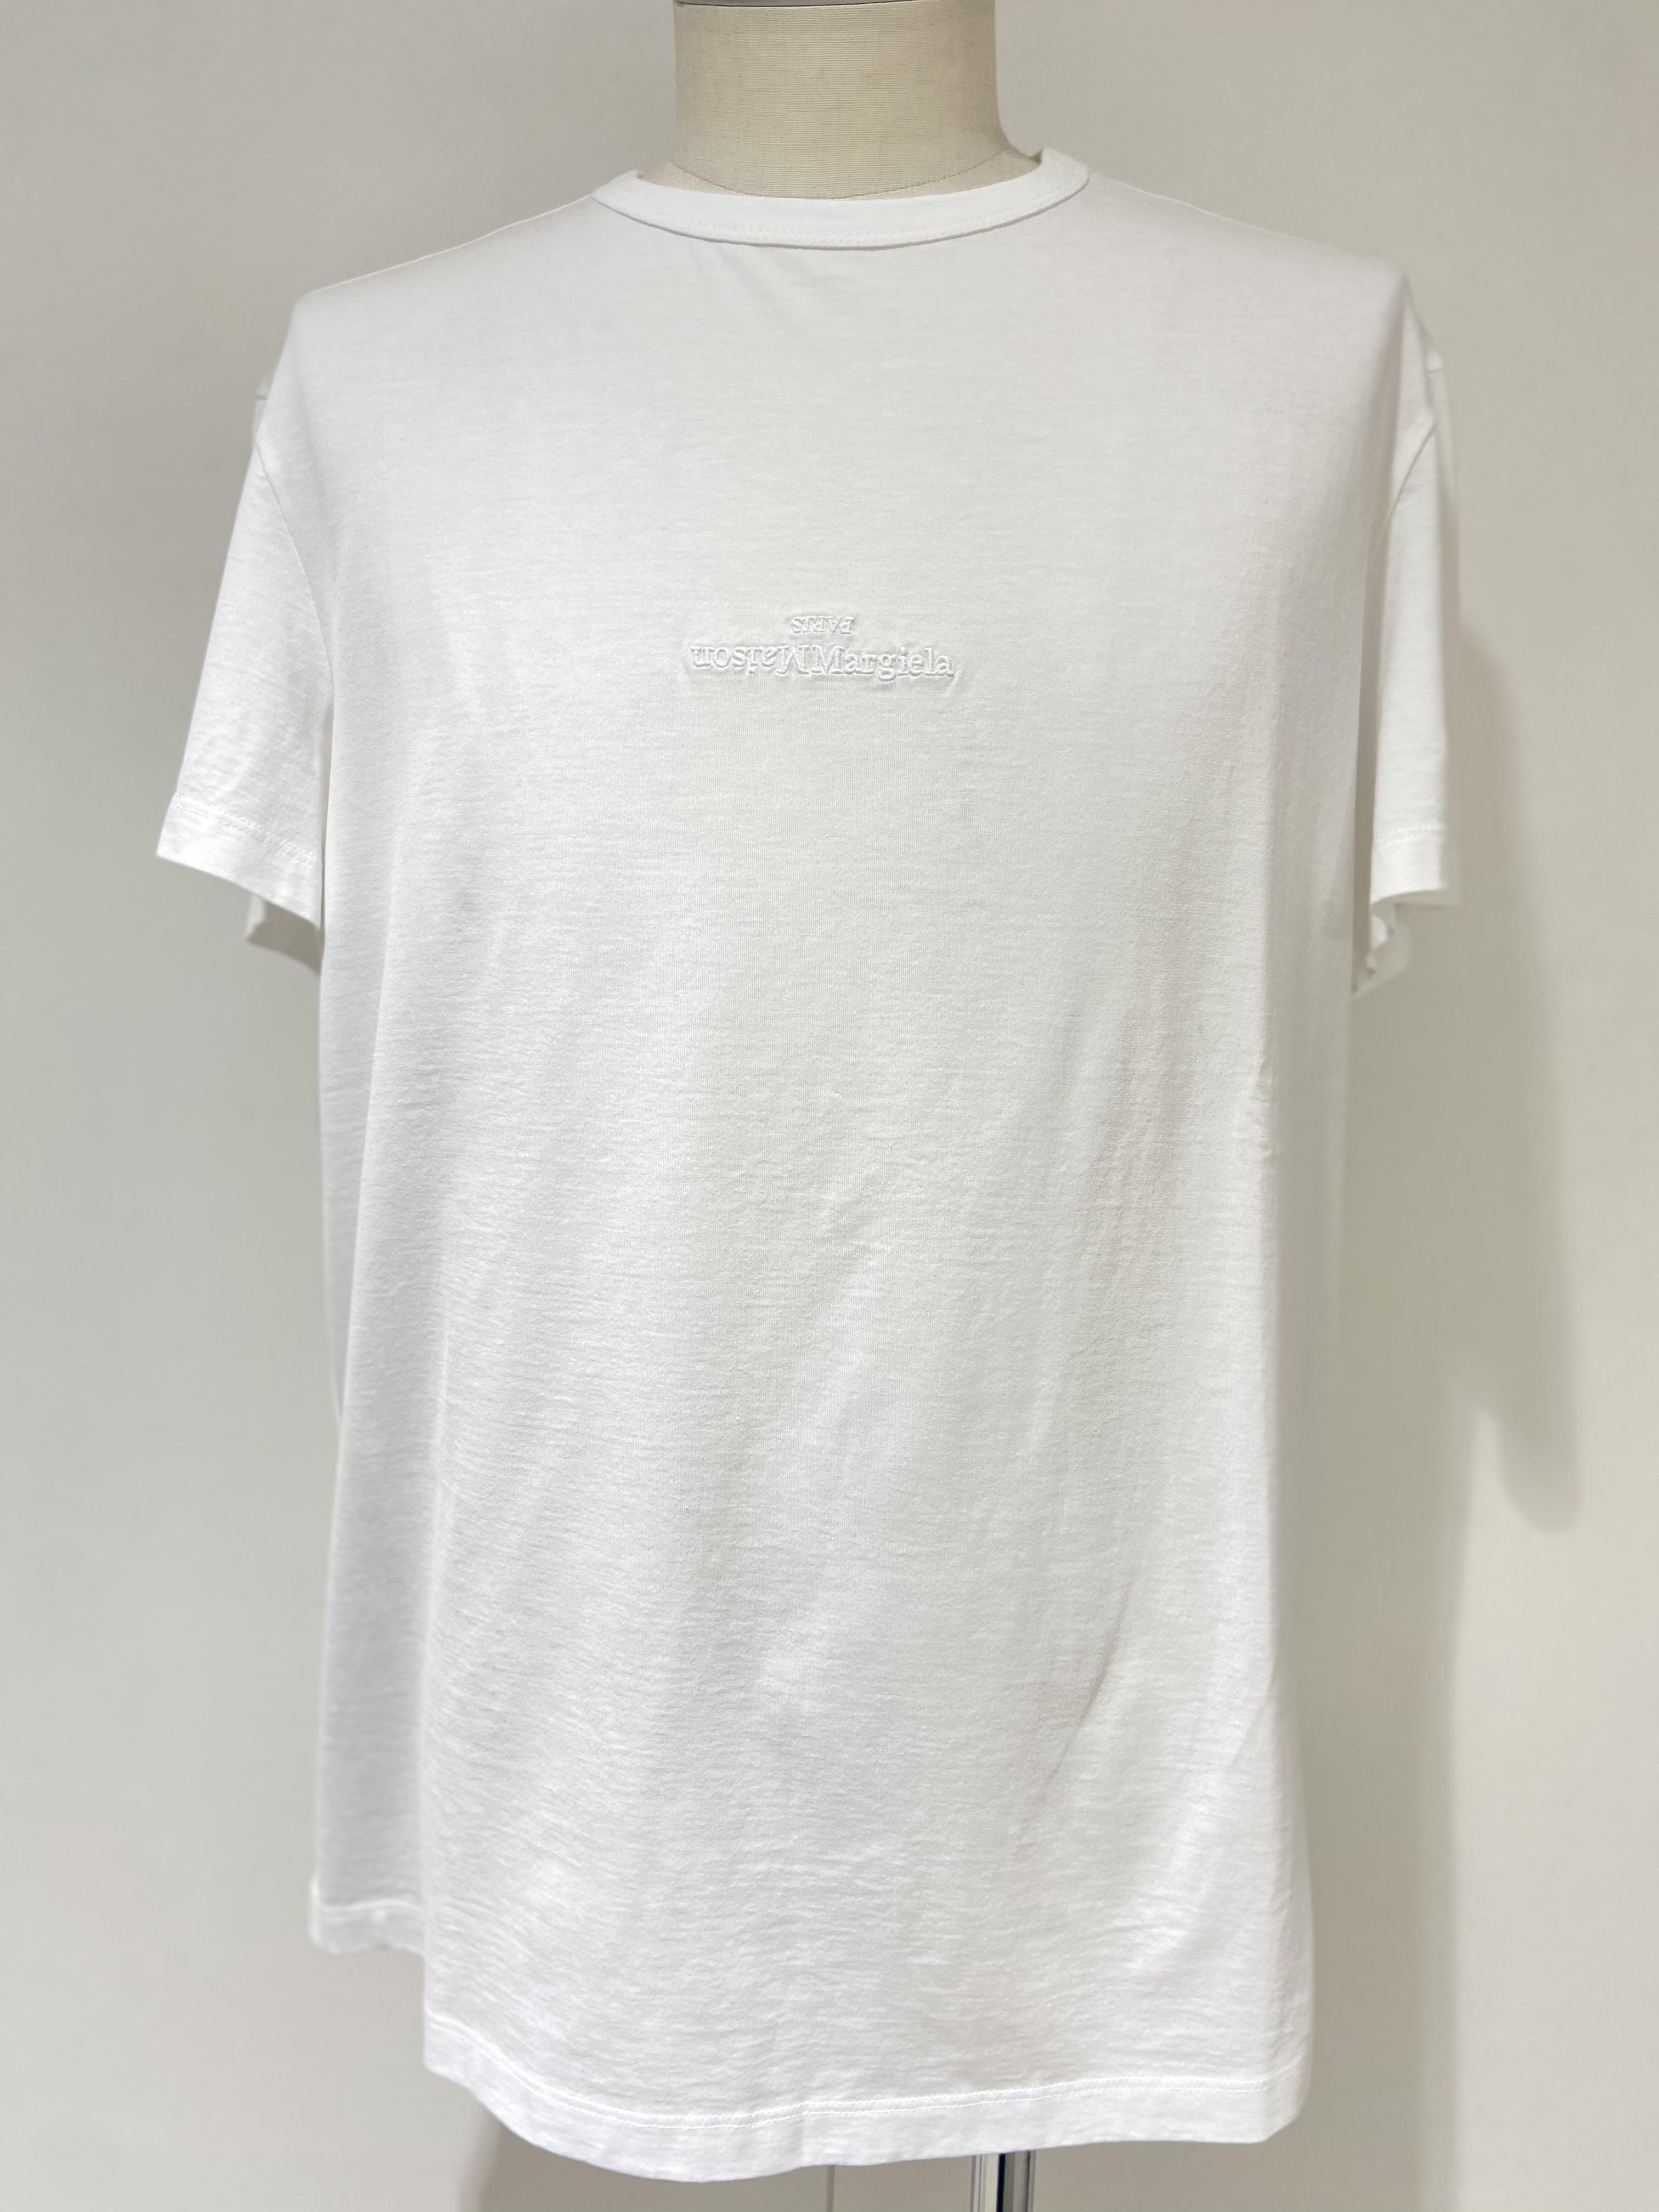 【Maison Margiela】ディストーテッドロゴTシャツ